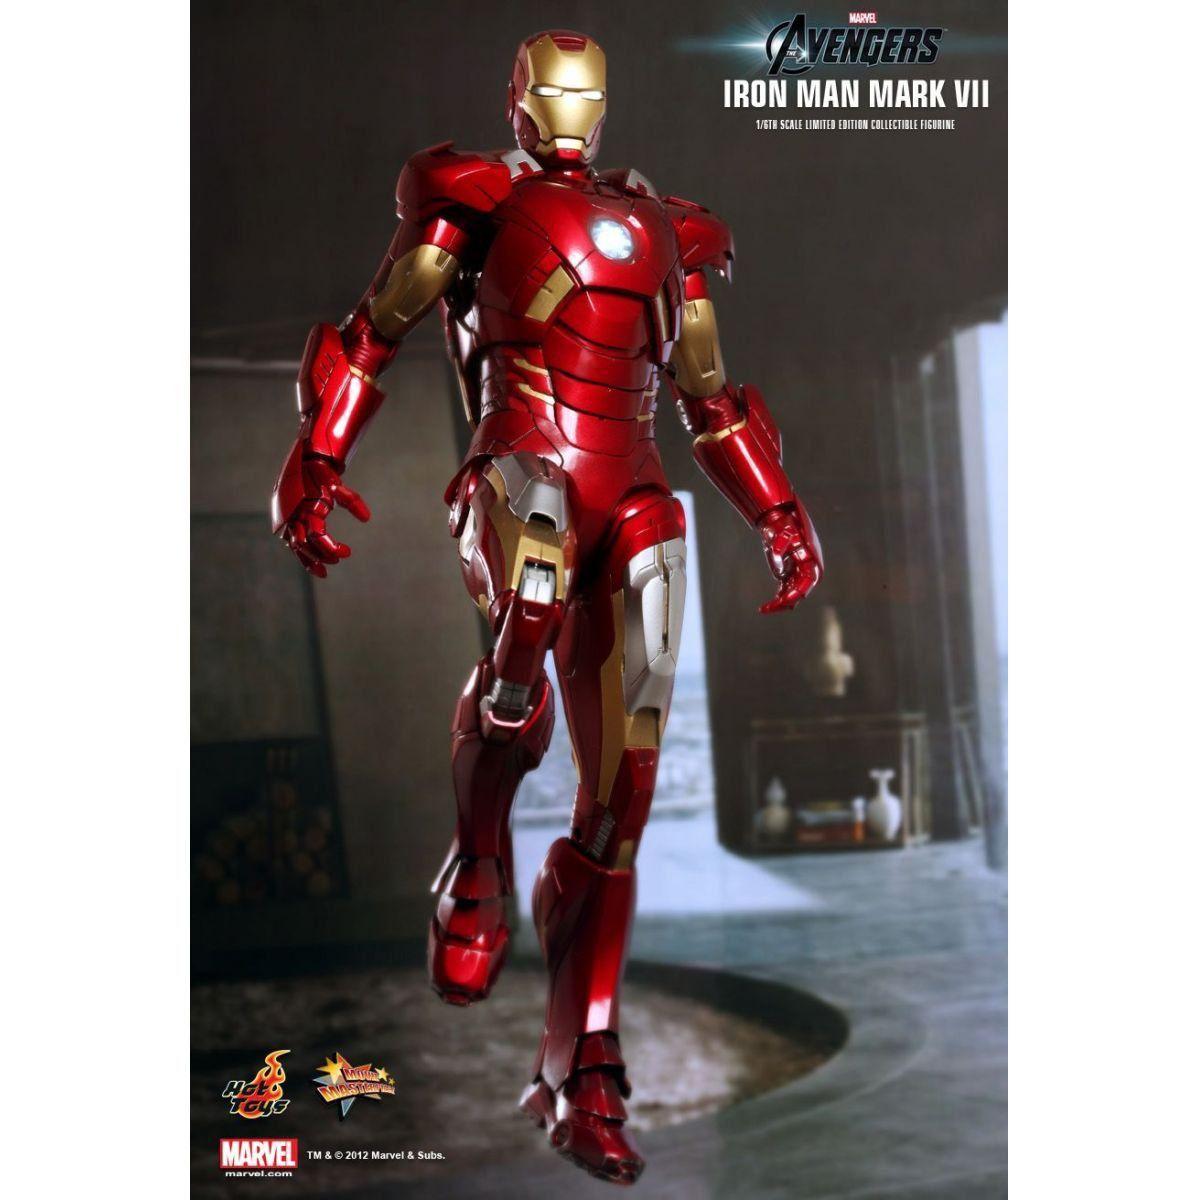 Boneco Iron Man (Homem de Ferro) Mark VII 1/6 - Hot Toys